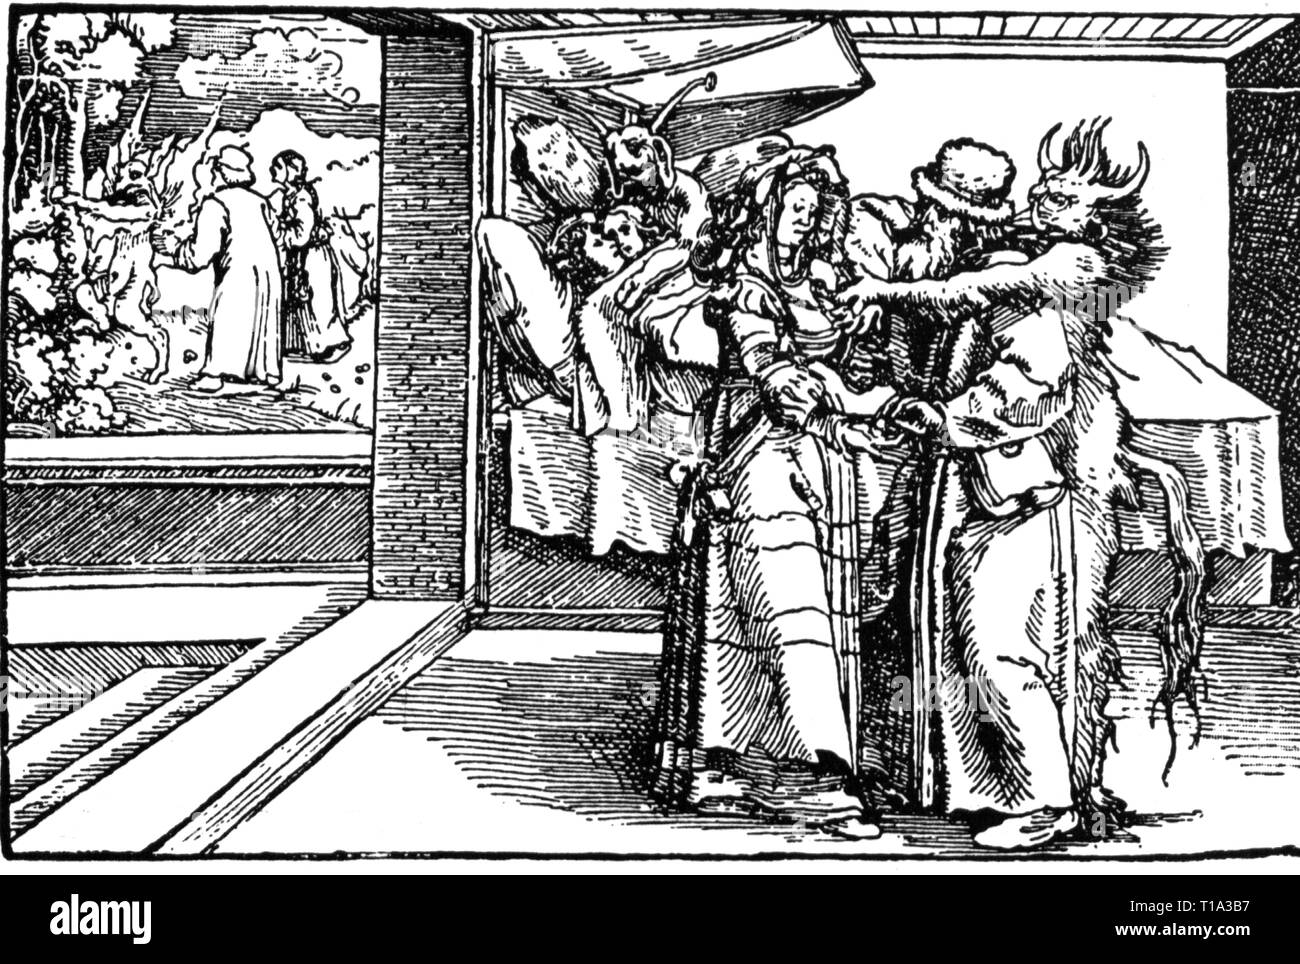 Religion, Engel und Teufel, Dämon der Bawdiness, Holzschnitt, Additional-Rights - Clearance-Info - Not-Available Stockbild